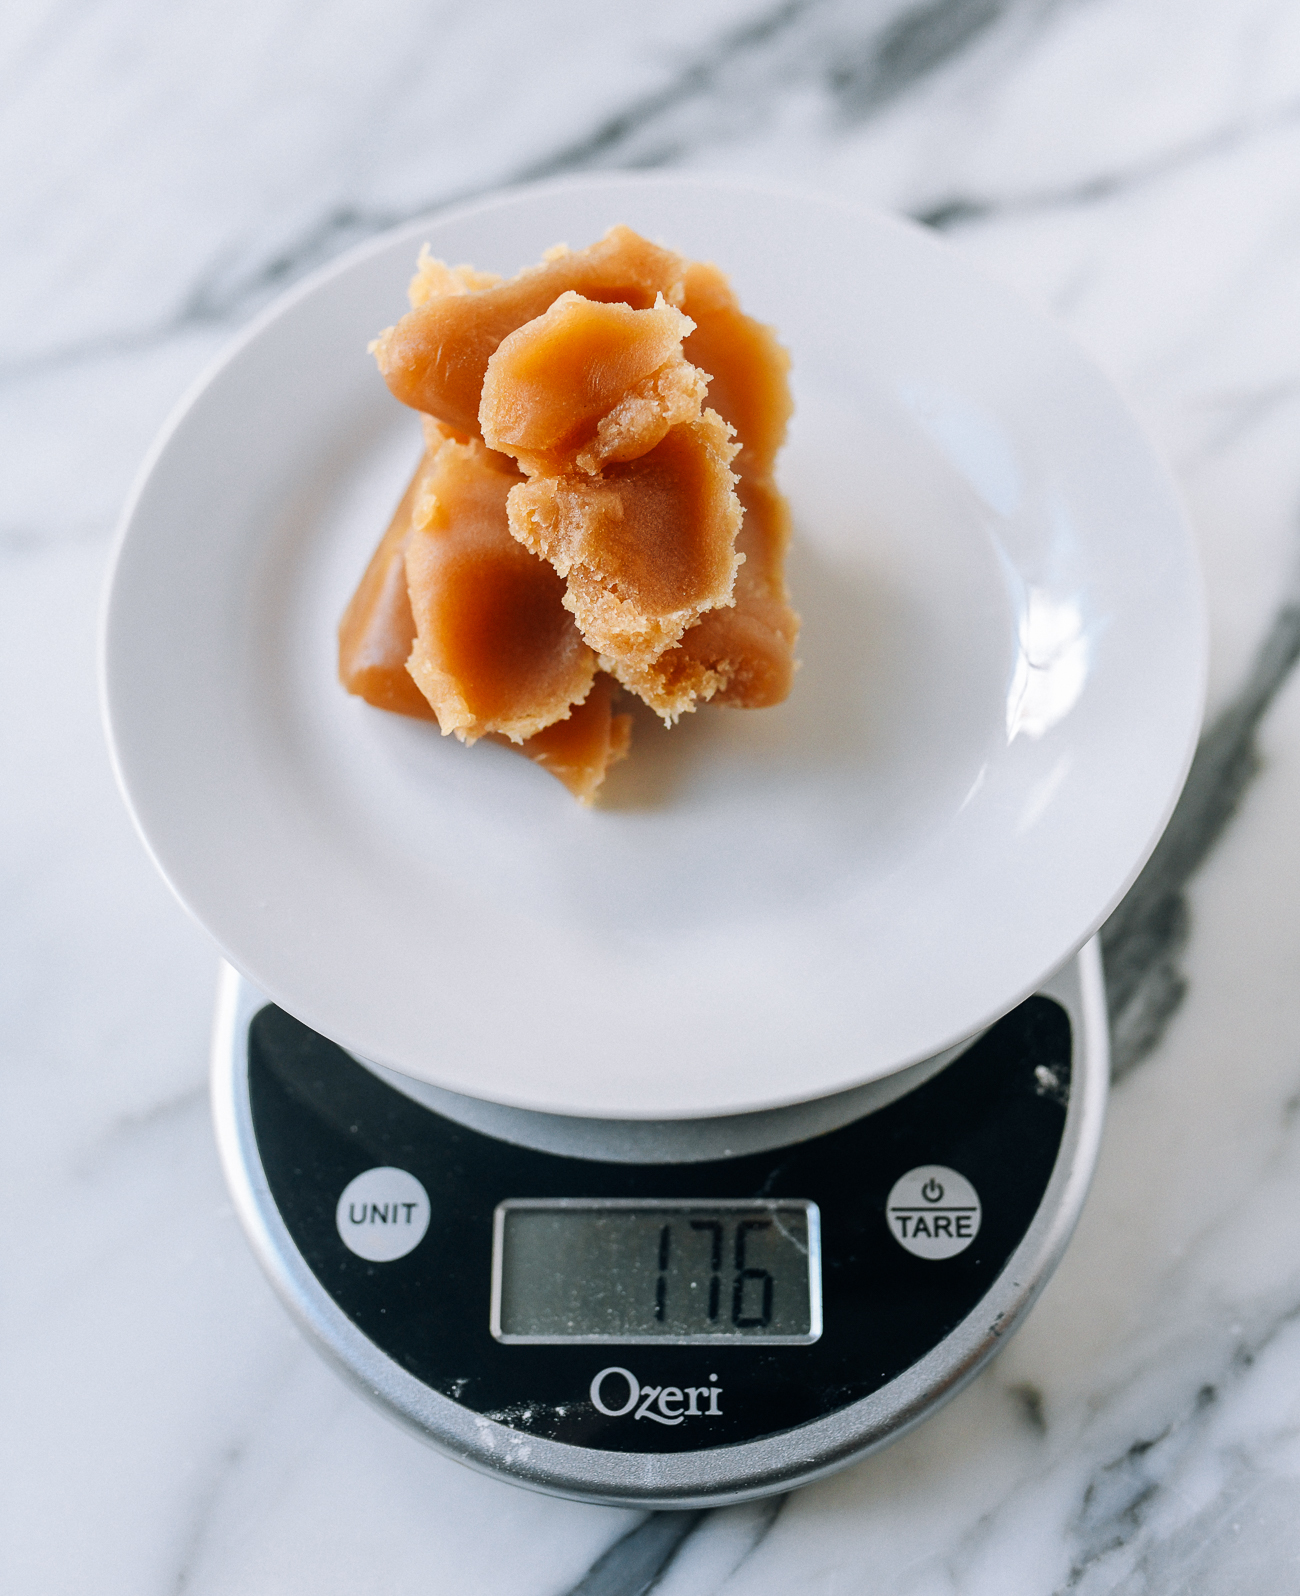 Measuring lotus paste on digital kitchen scale